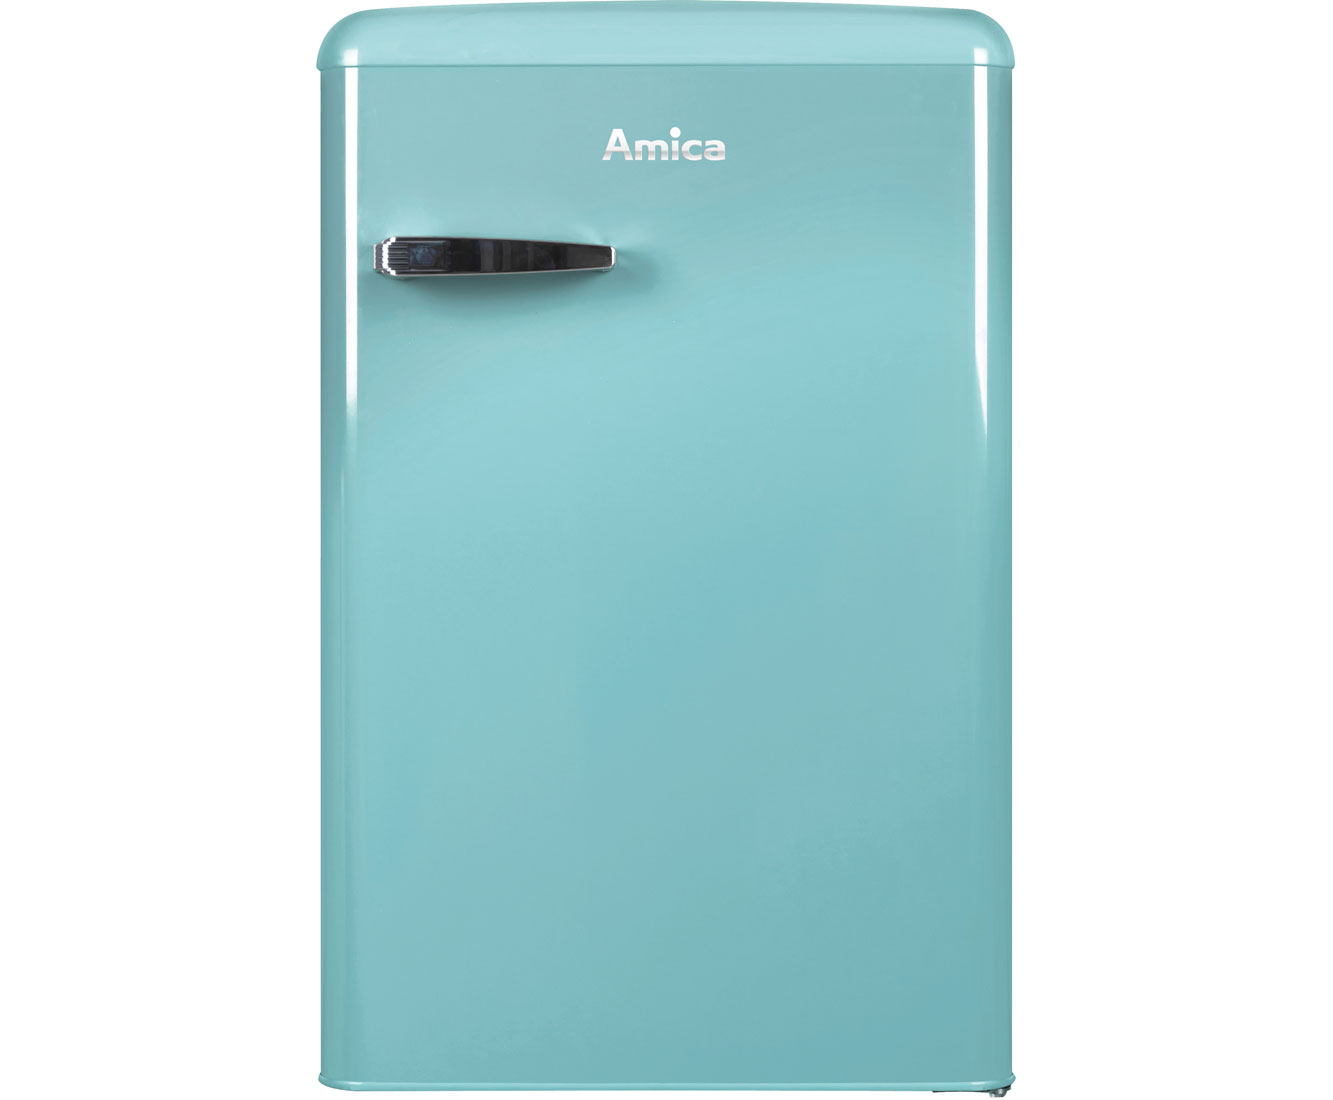 Retro Kühlschrank 85 Cm : Amica vks 15622 t kühlschrank türkisblau retro design a